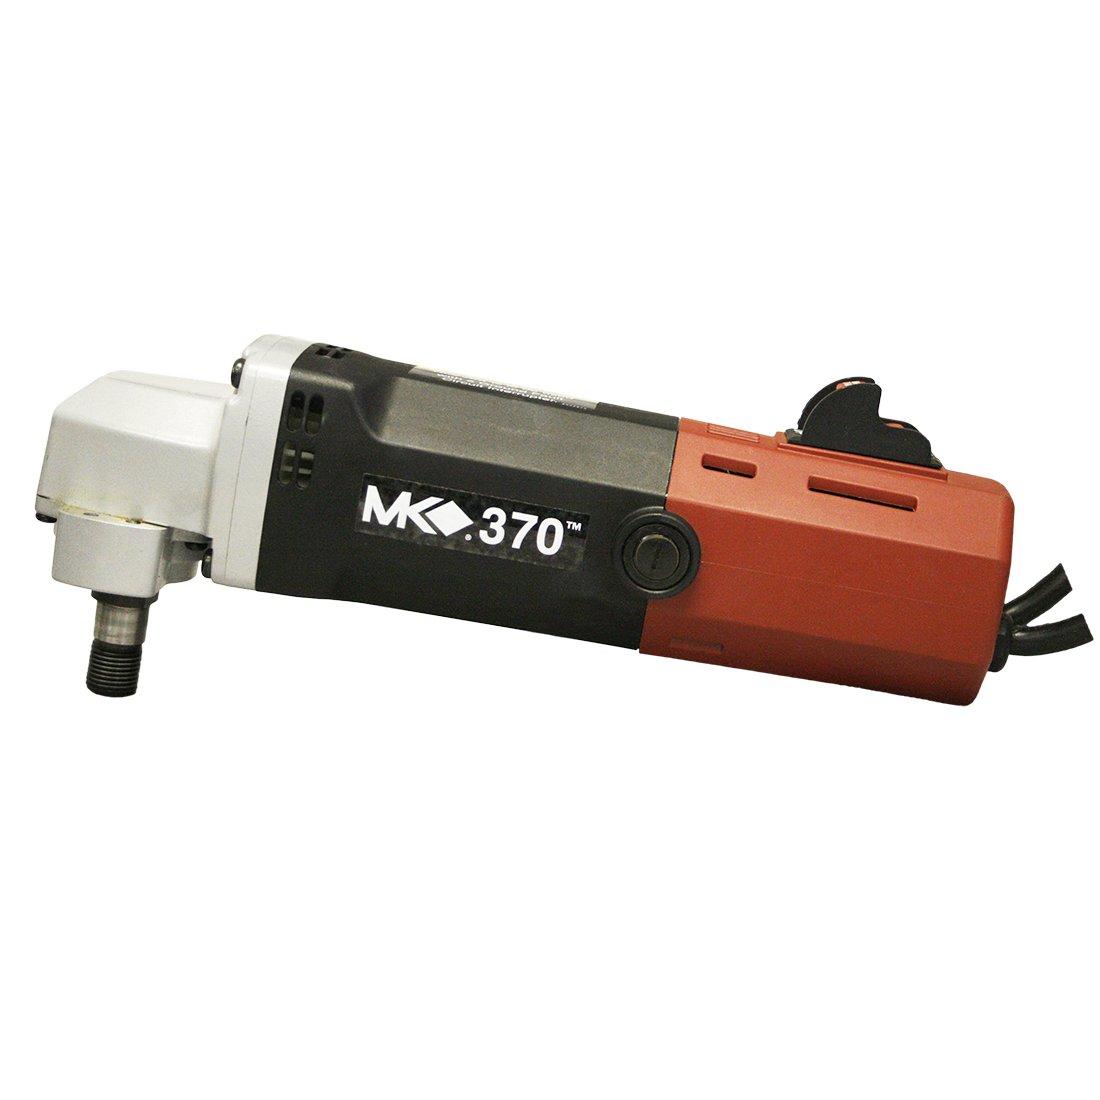 MK Motor for MK-270, MK-370, 470, 370EXP, 770, 770EXP Tile Saws -- 120 V by MK Diamond